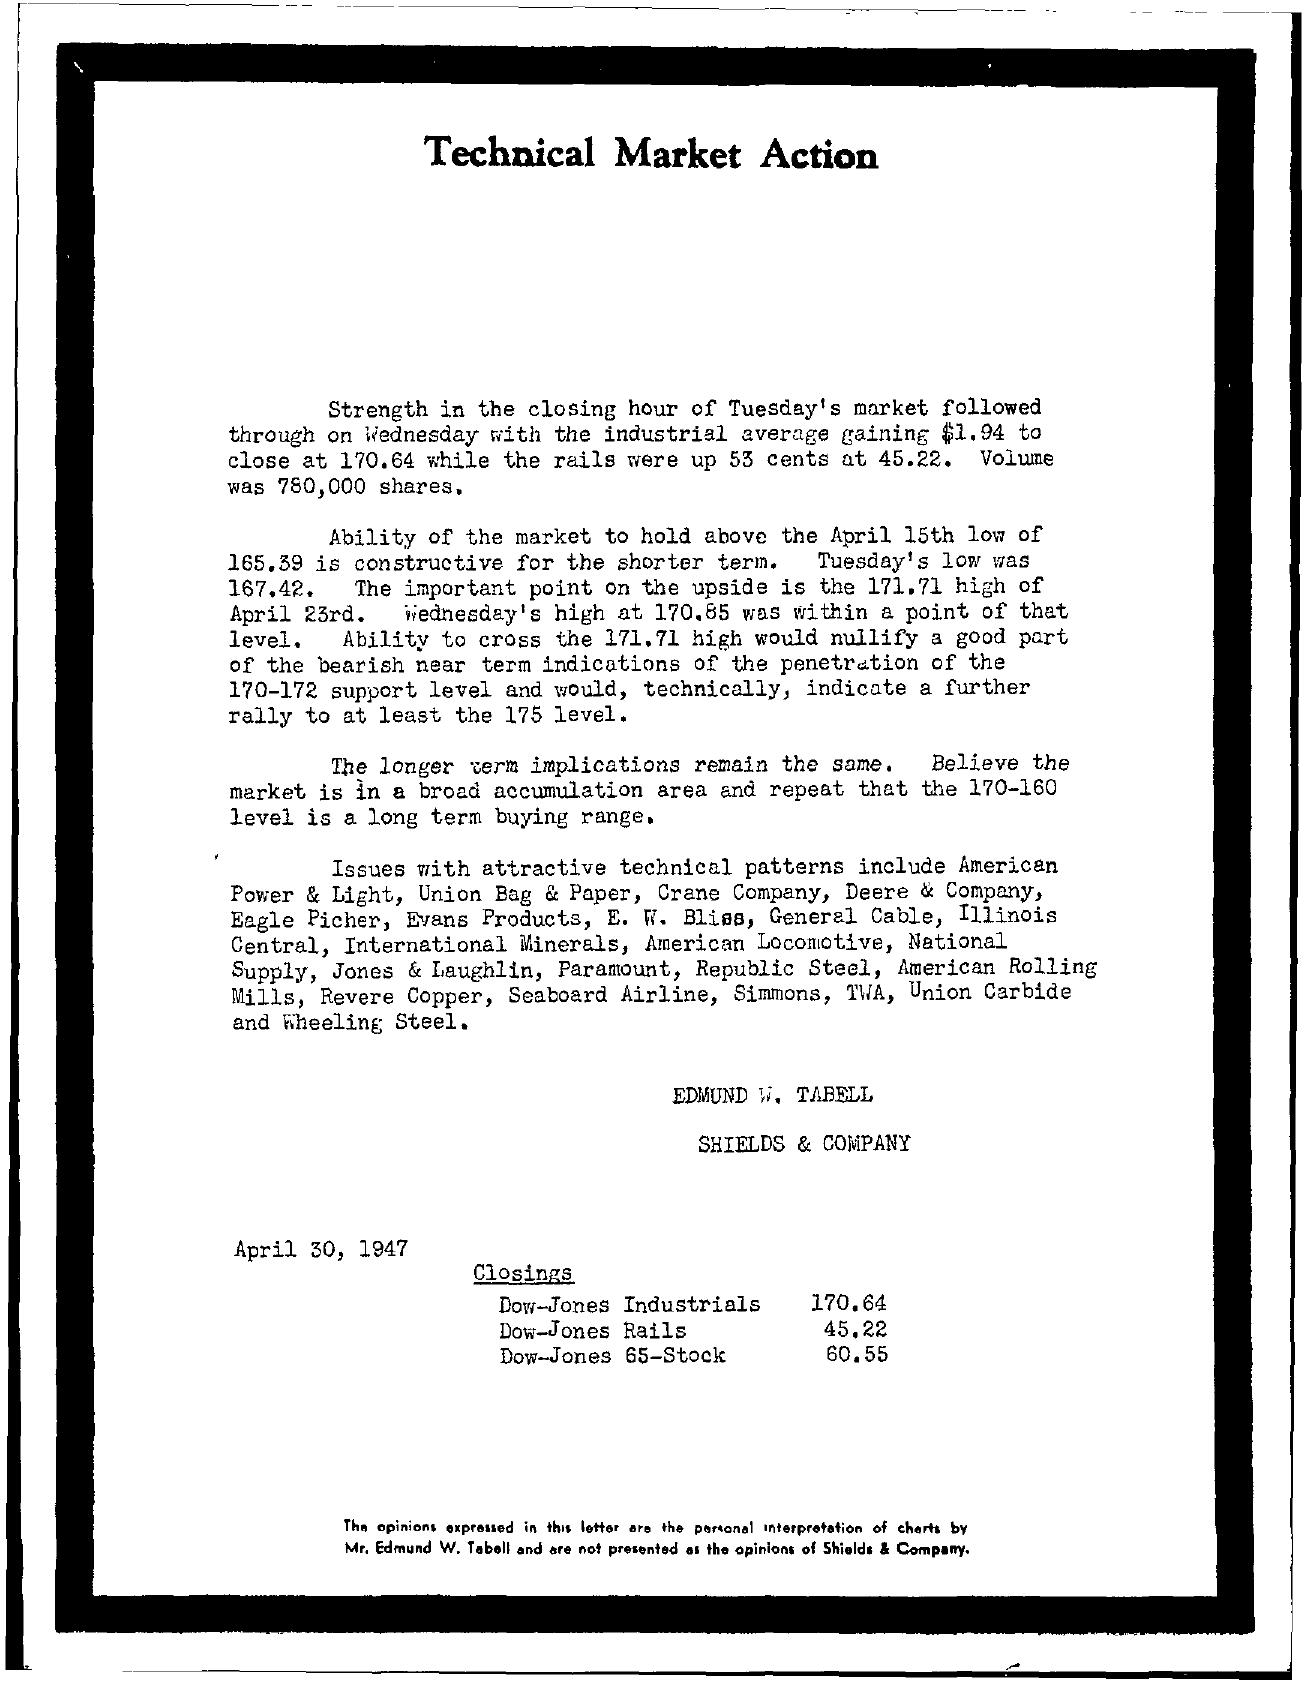 Tabell's Market Letter - April 30, 1947